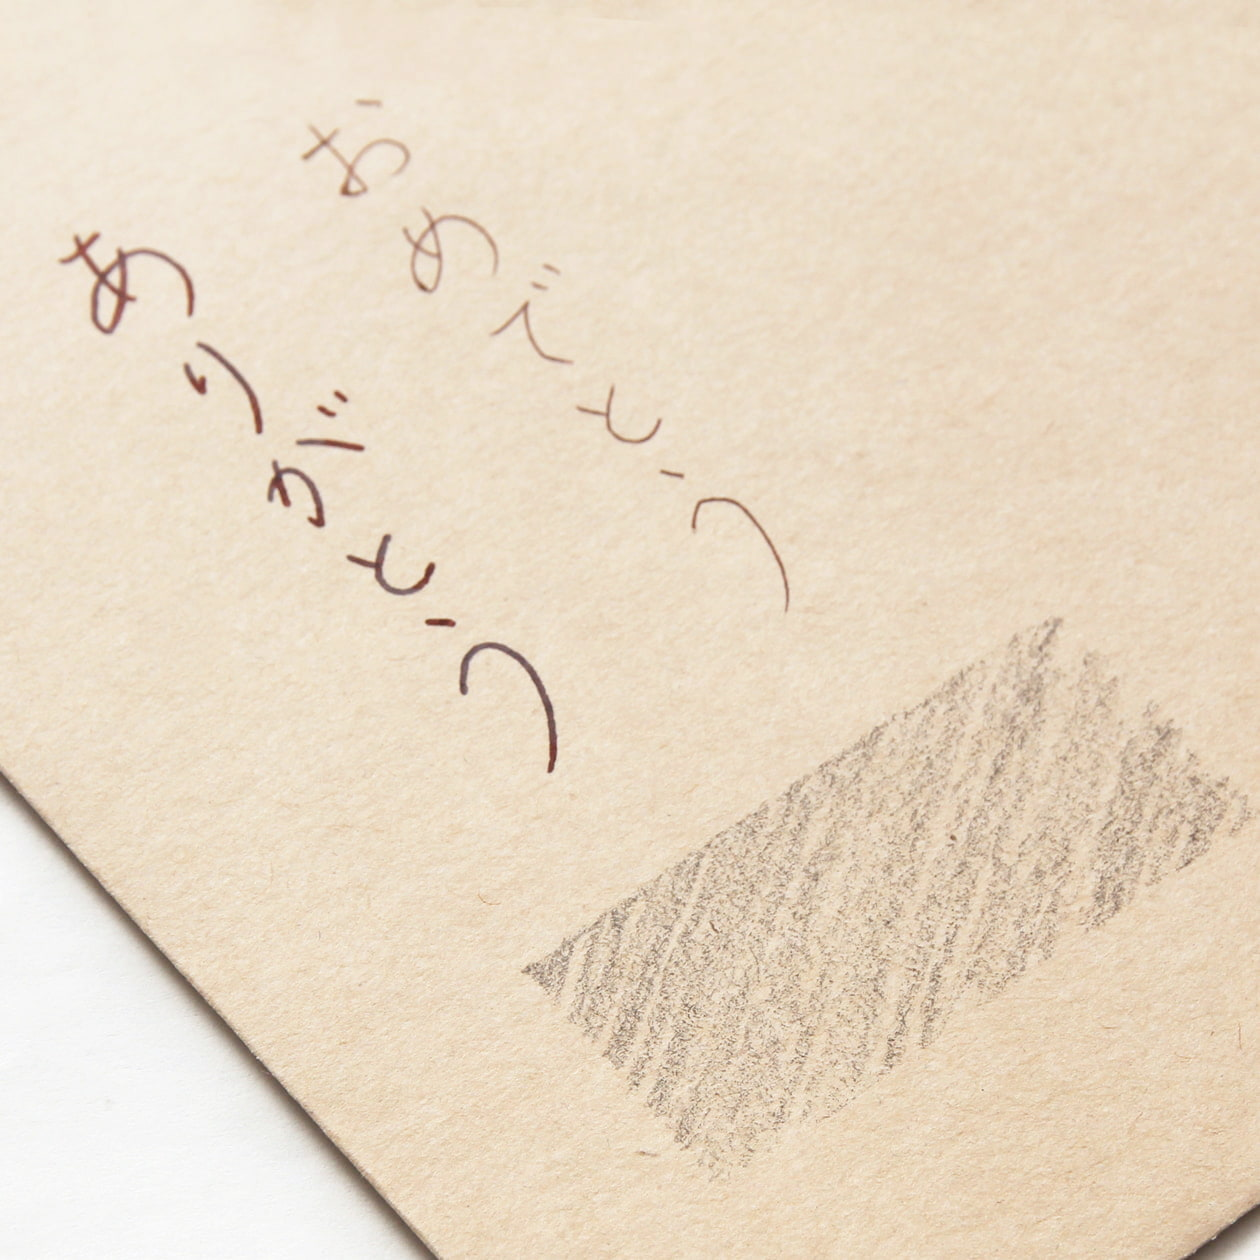 SE16カマス封筒 HAGURUMA Basic ウッドブラウン 100g